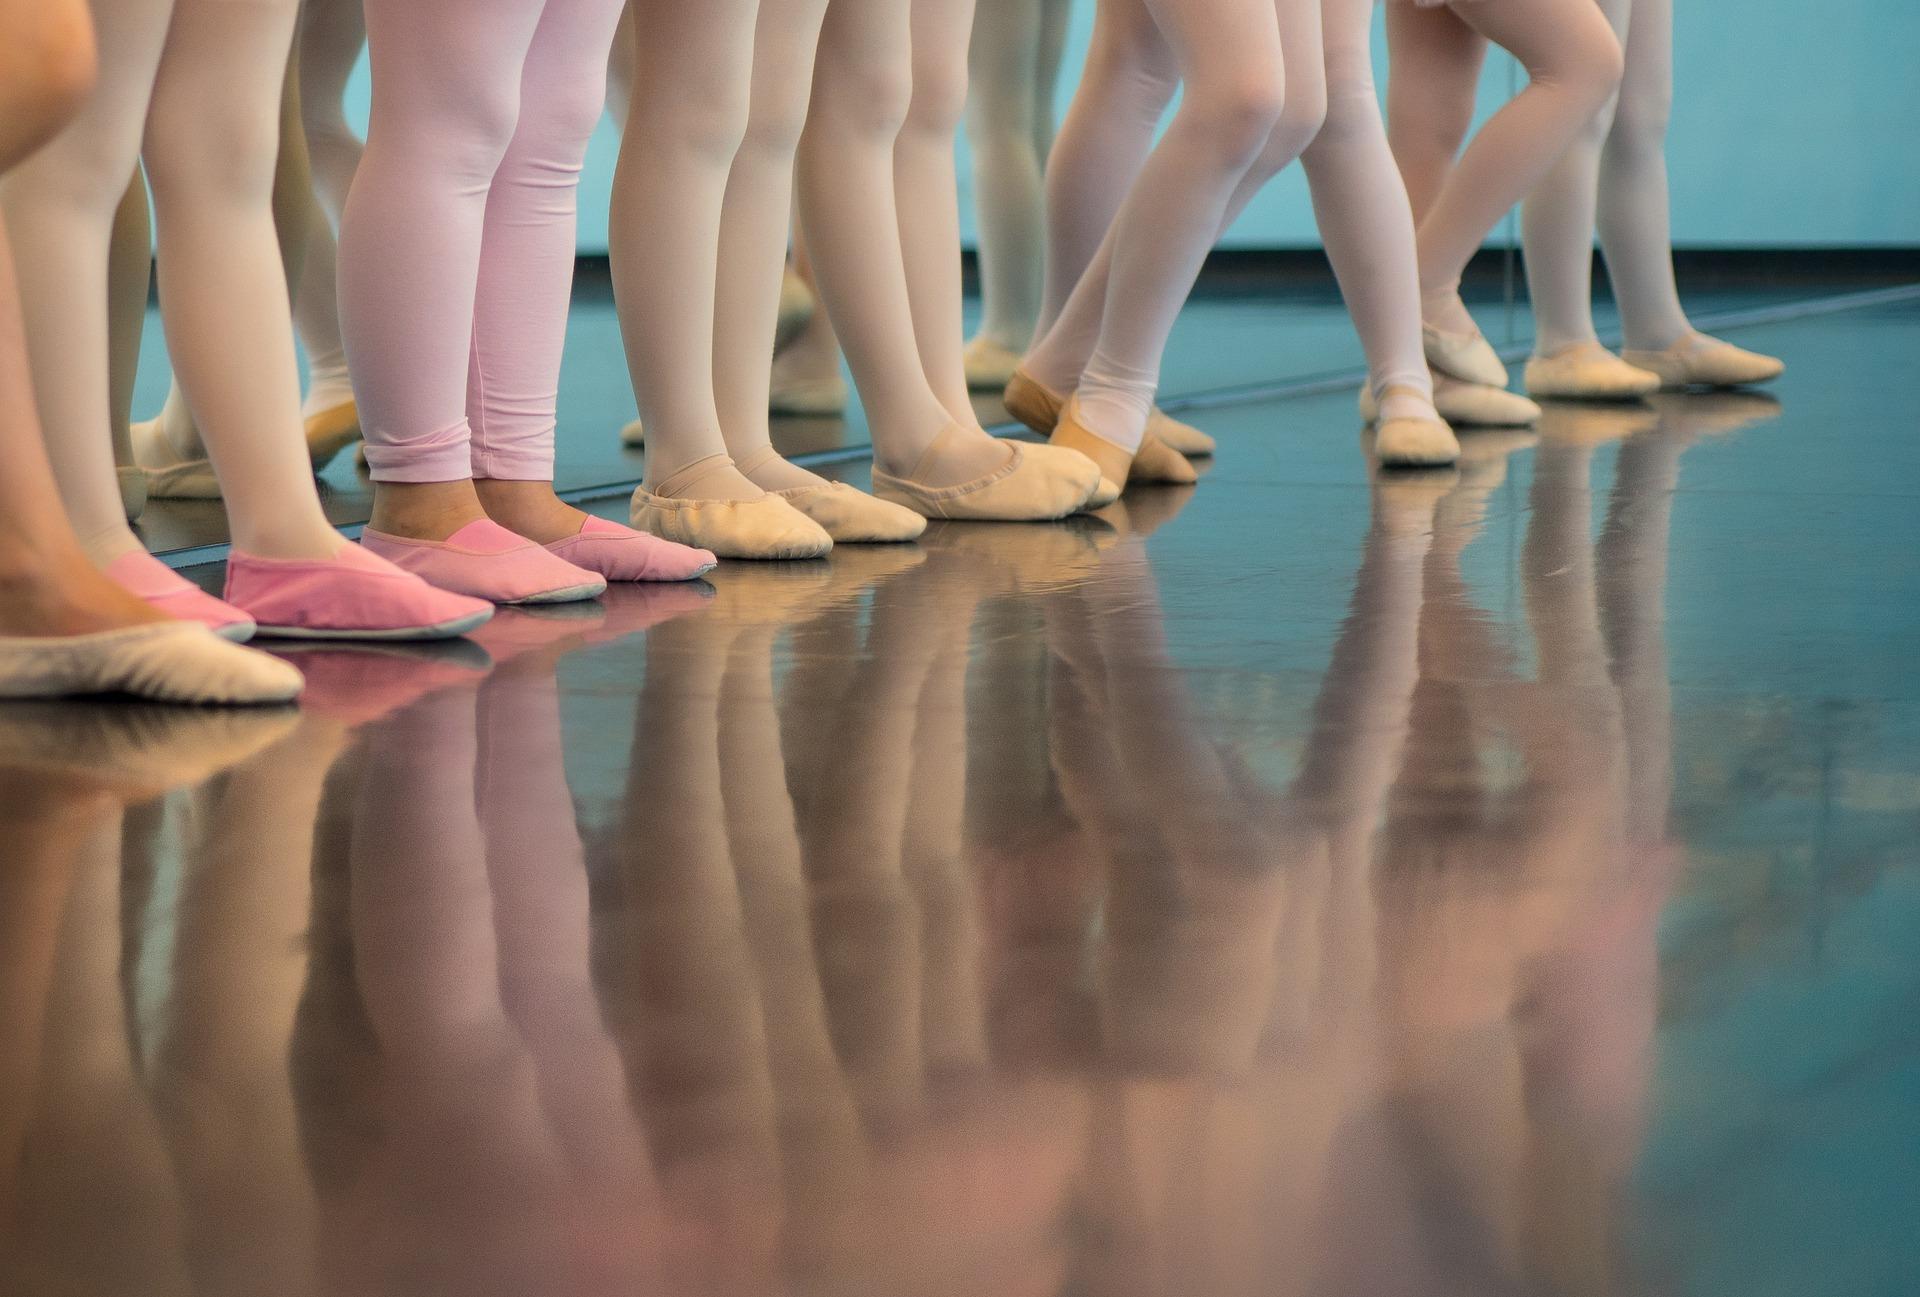 ballerina-1453074_1920.jpg